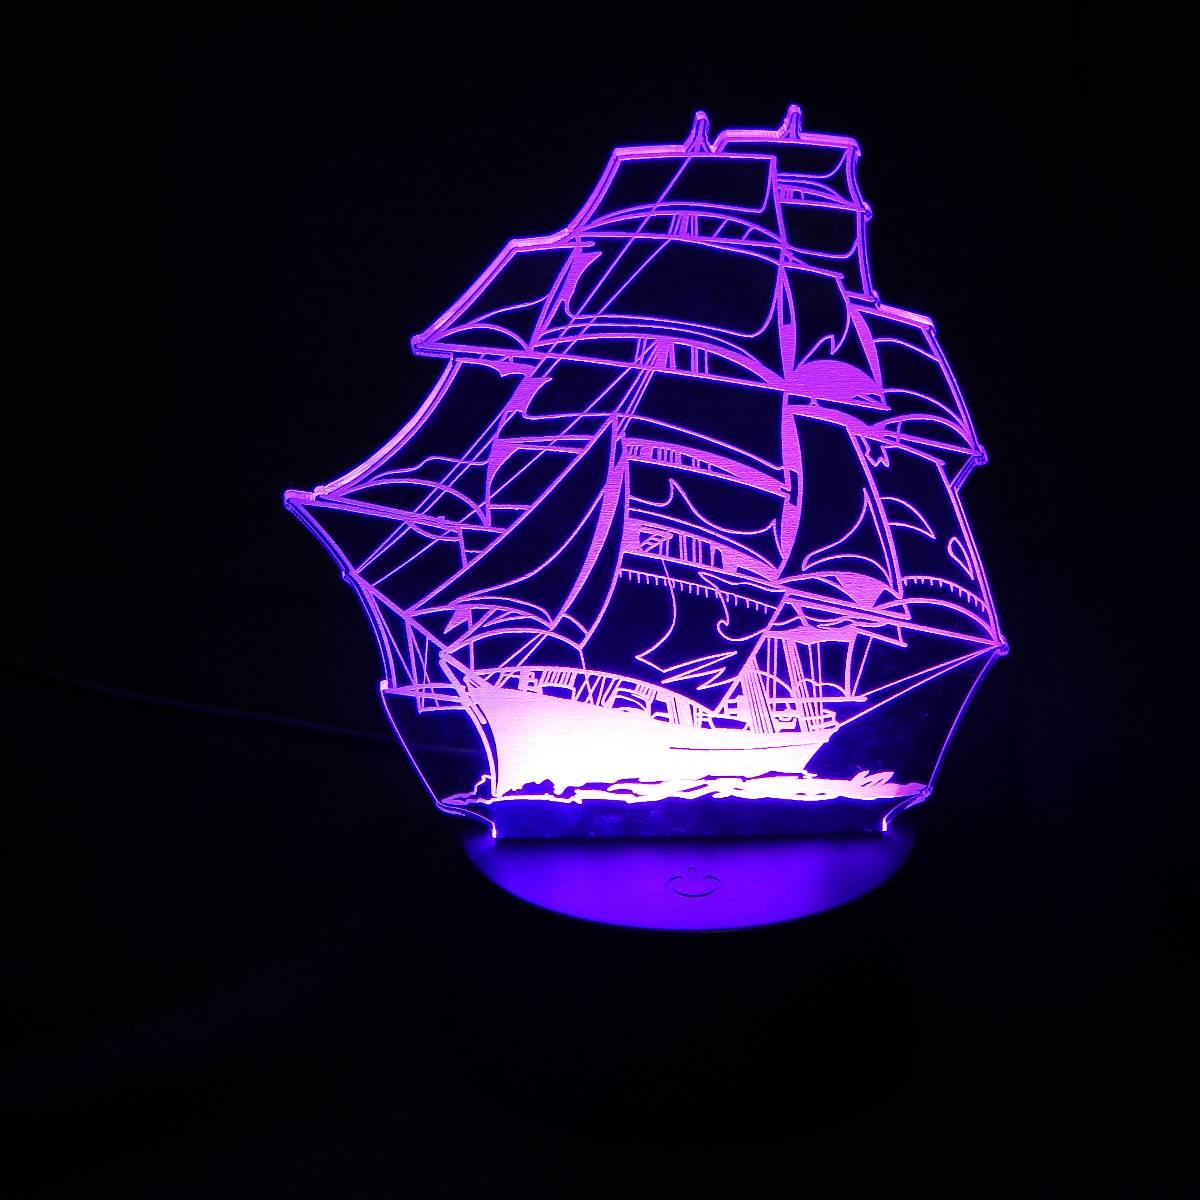 Lampu Meja Lampu Tidur Lampu Hias Kapal LED 3D Tradisional3